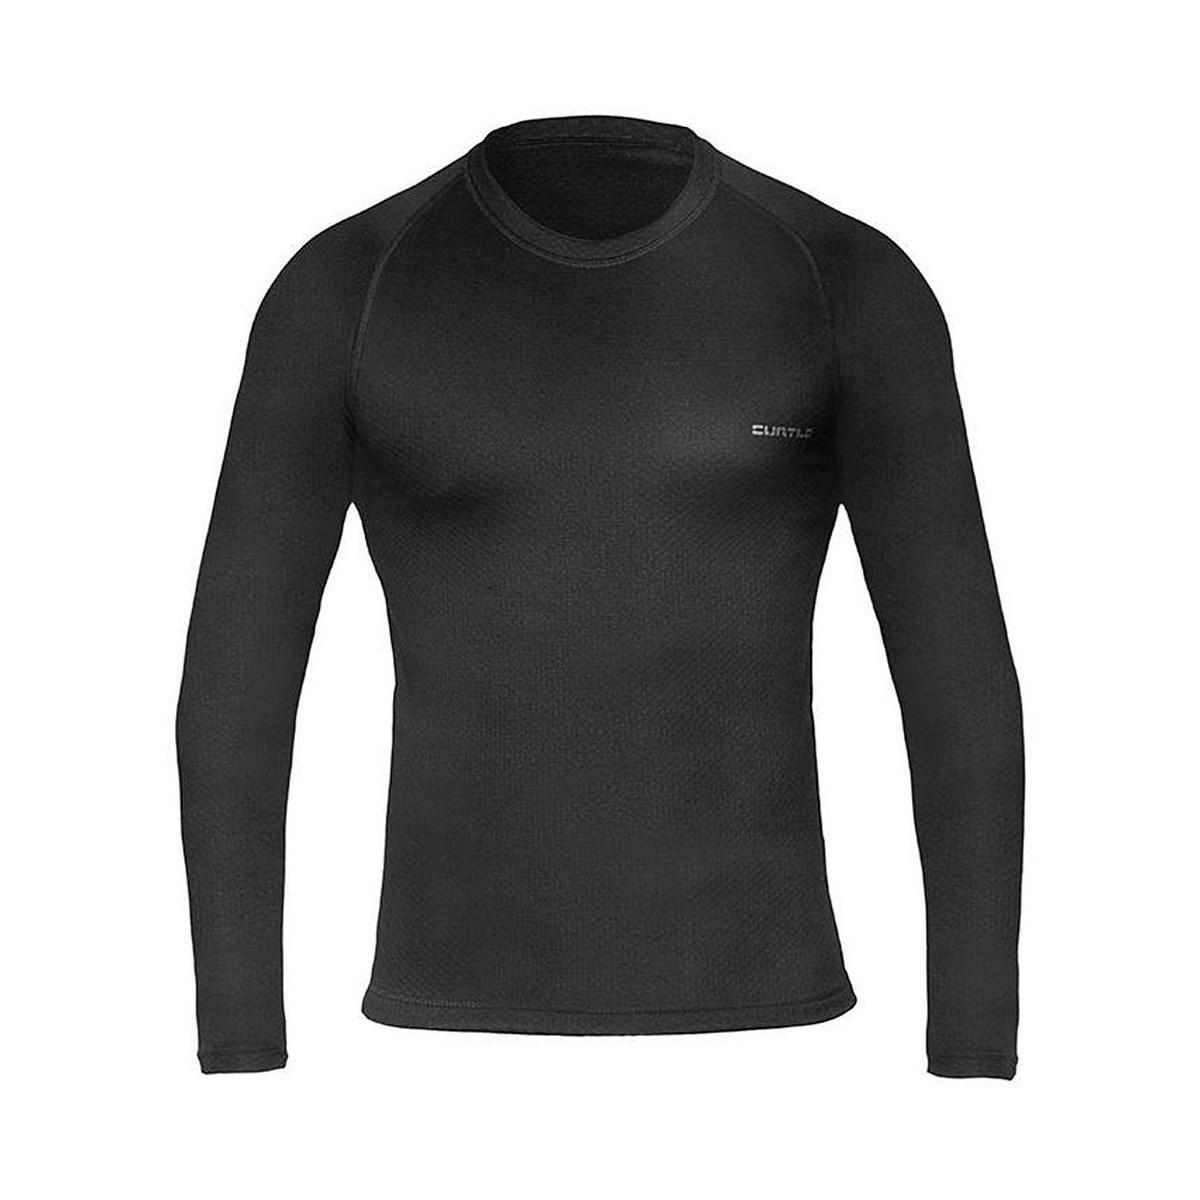 Camiseta Curtlo Thermoskin ML